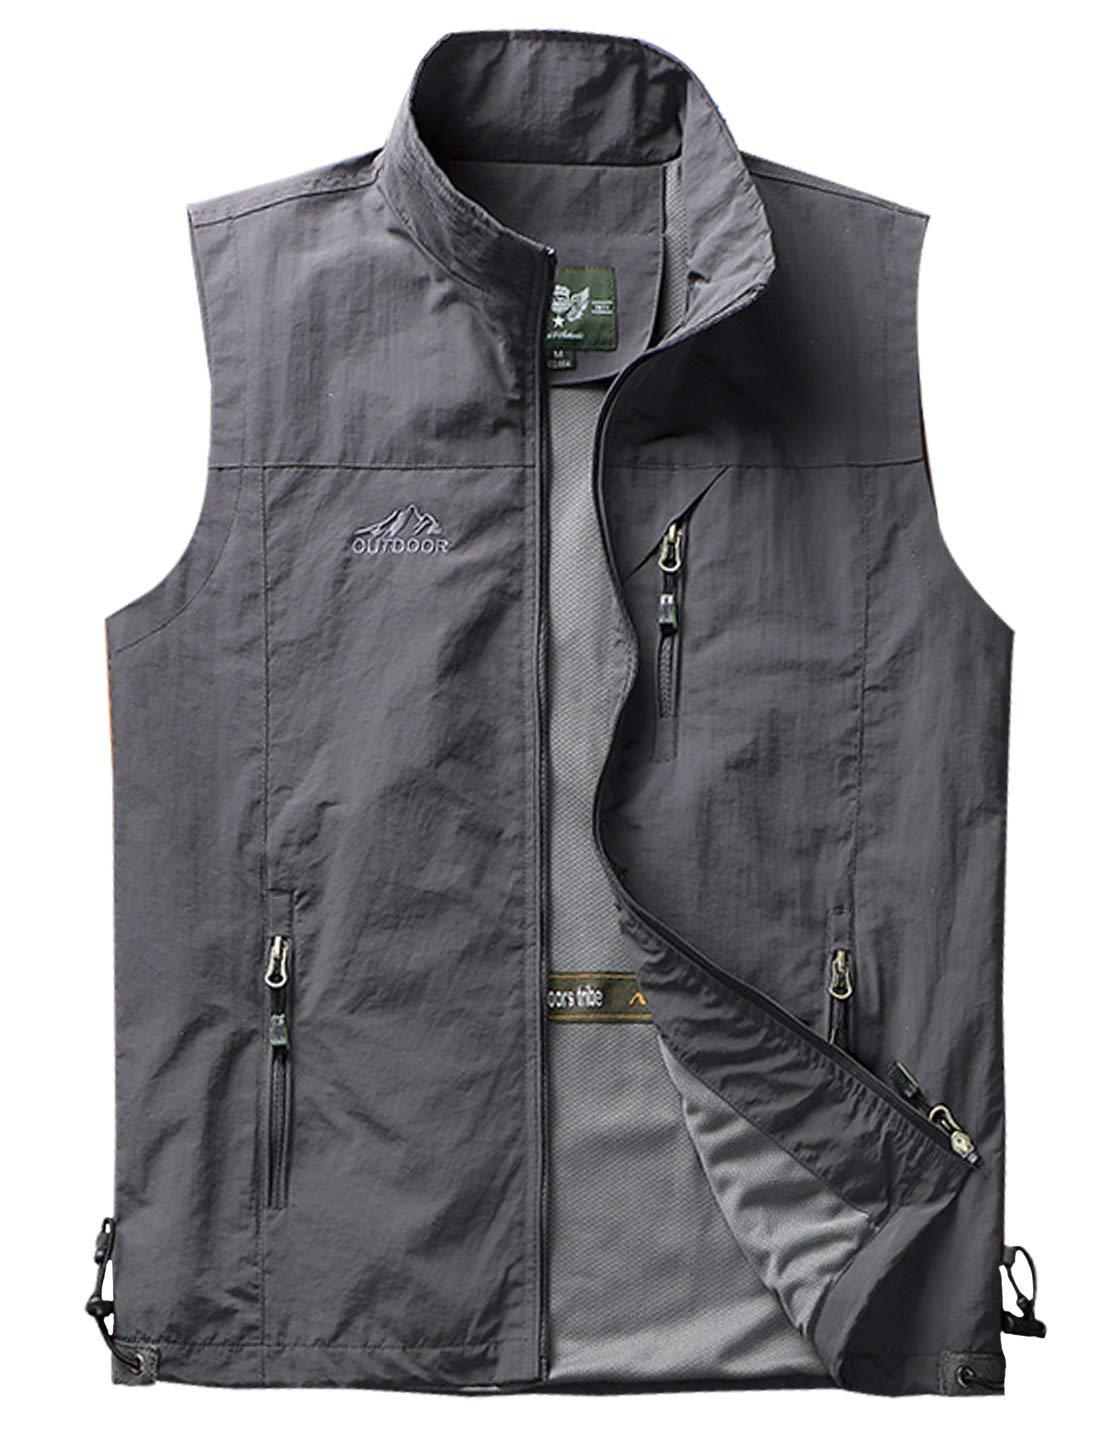 Yimoon Men's Safari Travel Vest Outdoor Lightweight Fishing Photo Vest